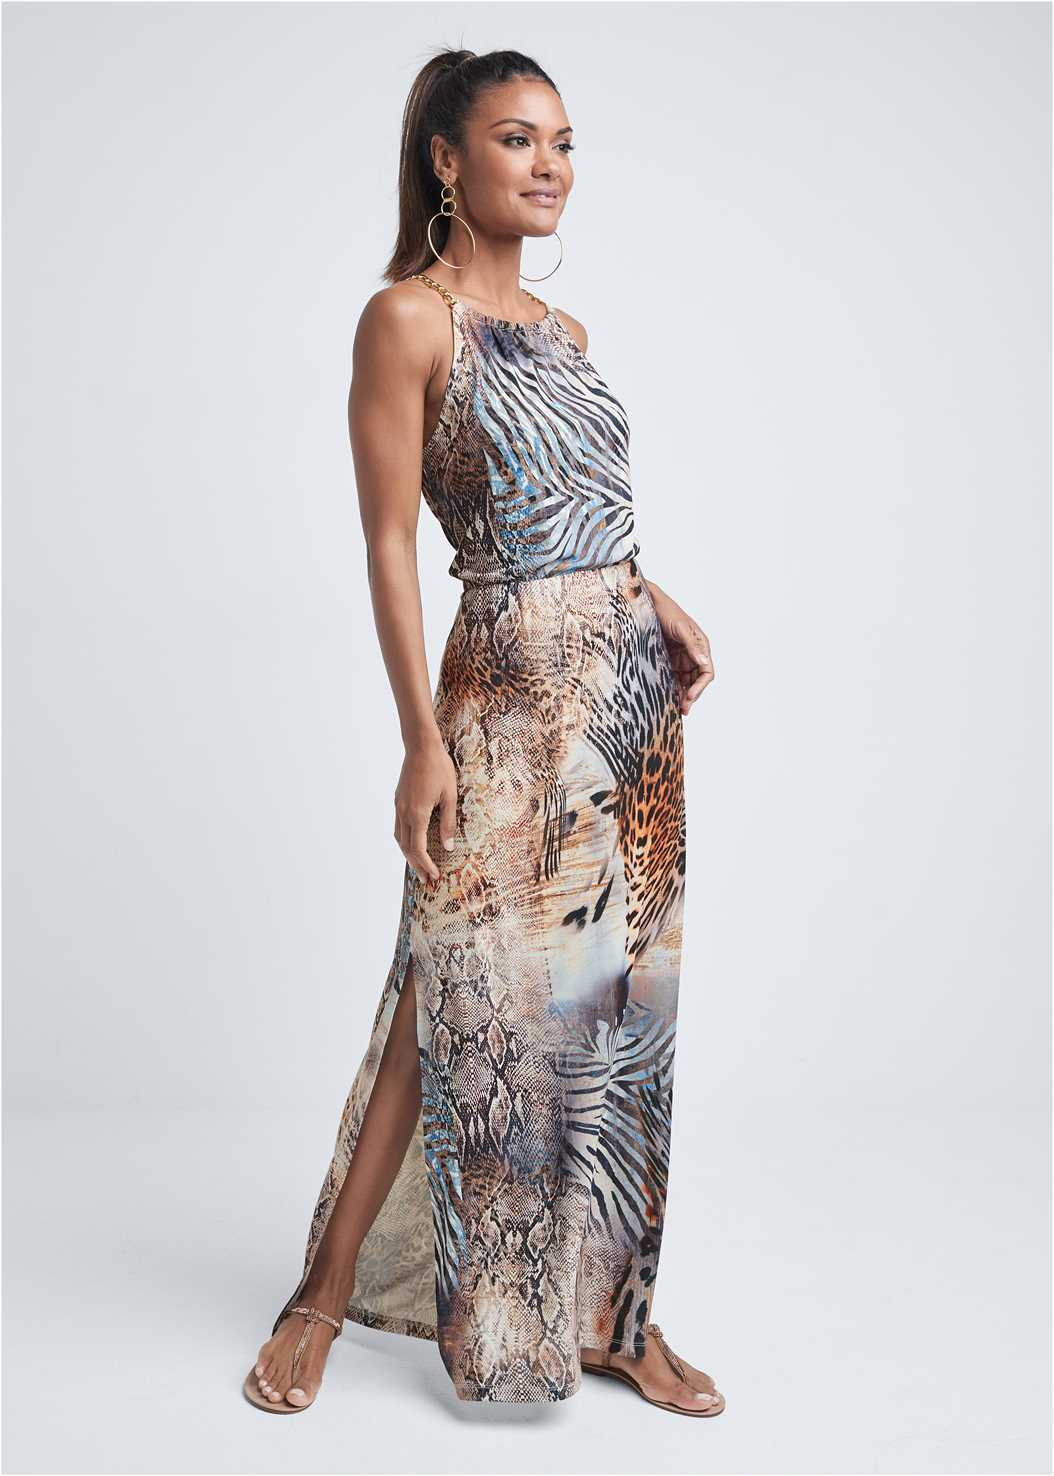 Chain Strap Maxi Dress,Embellished Tassel Clutch